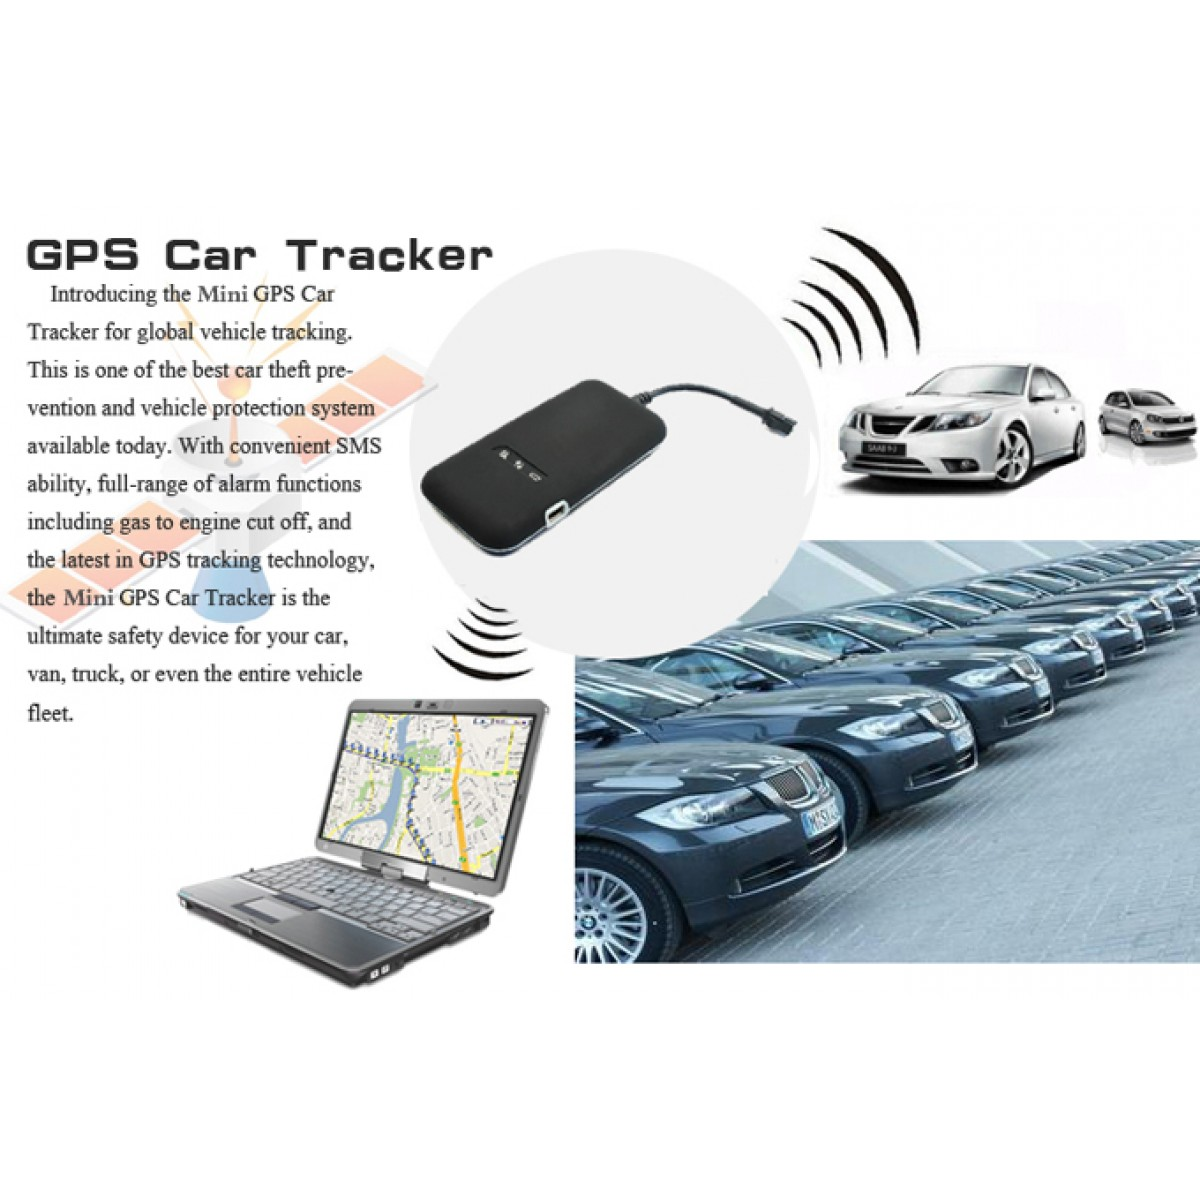 Soroko Trading Ltd - Smart Gadgets, Electronics, Spy ...